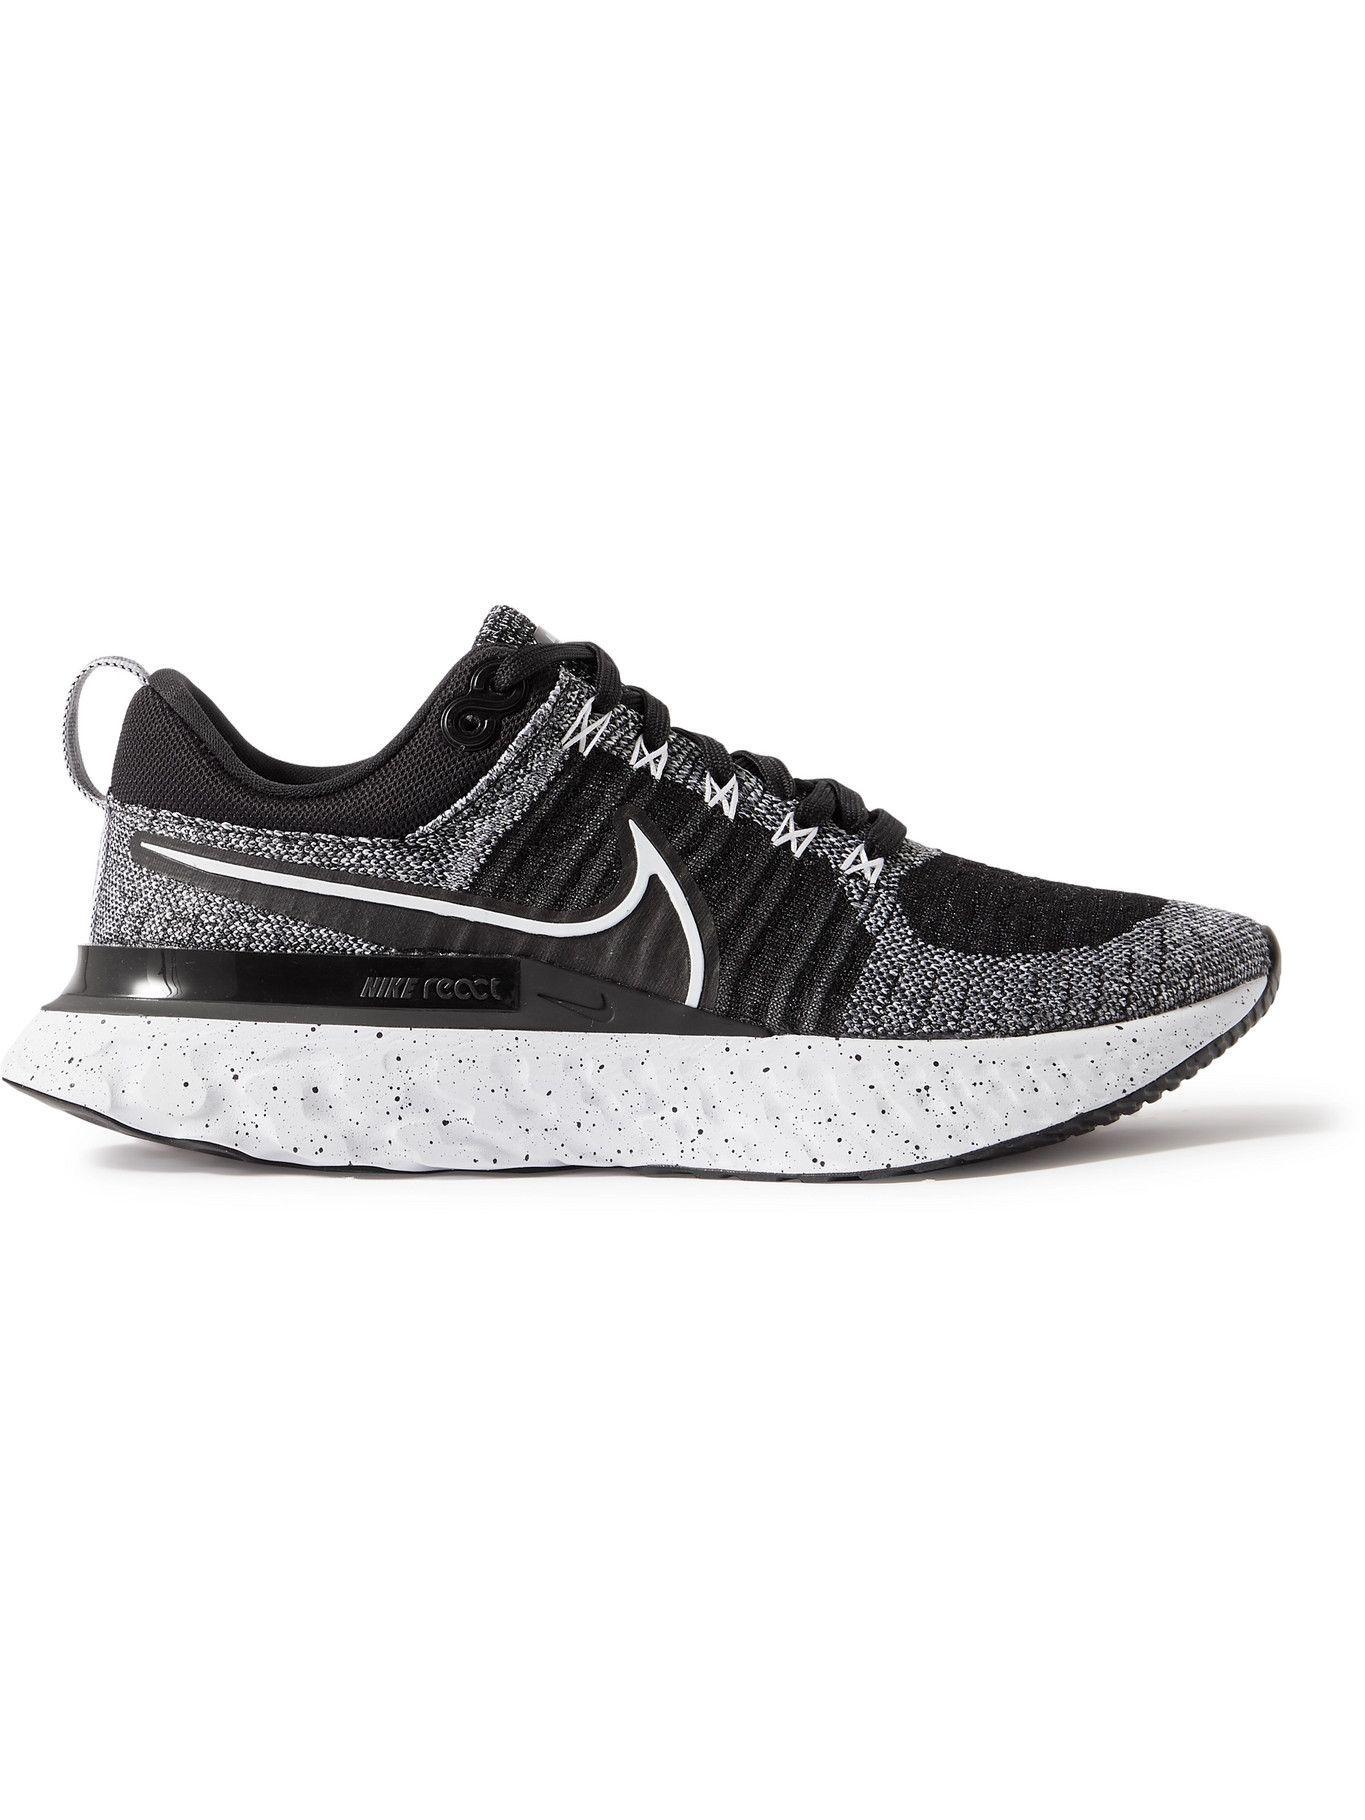 NIKE RUNNING - React Infinity Run 2 Flyknit Sneakers - Gray